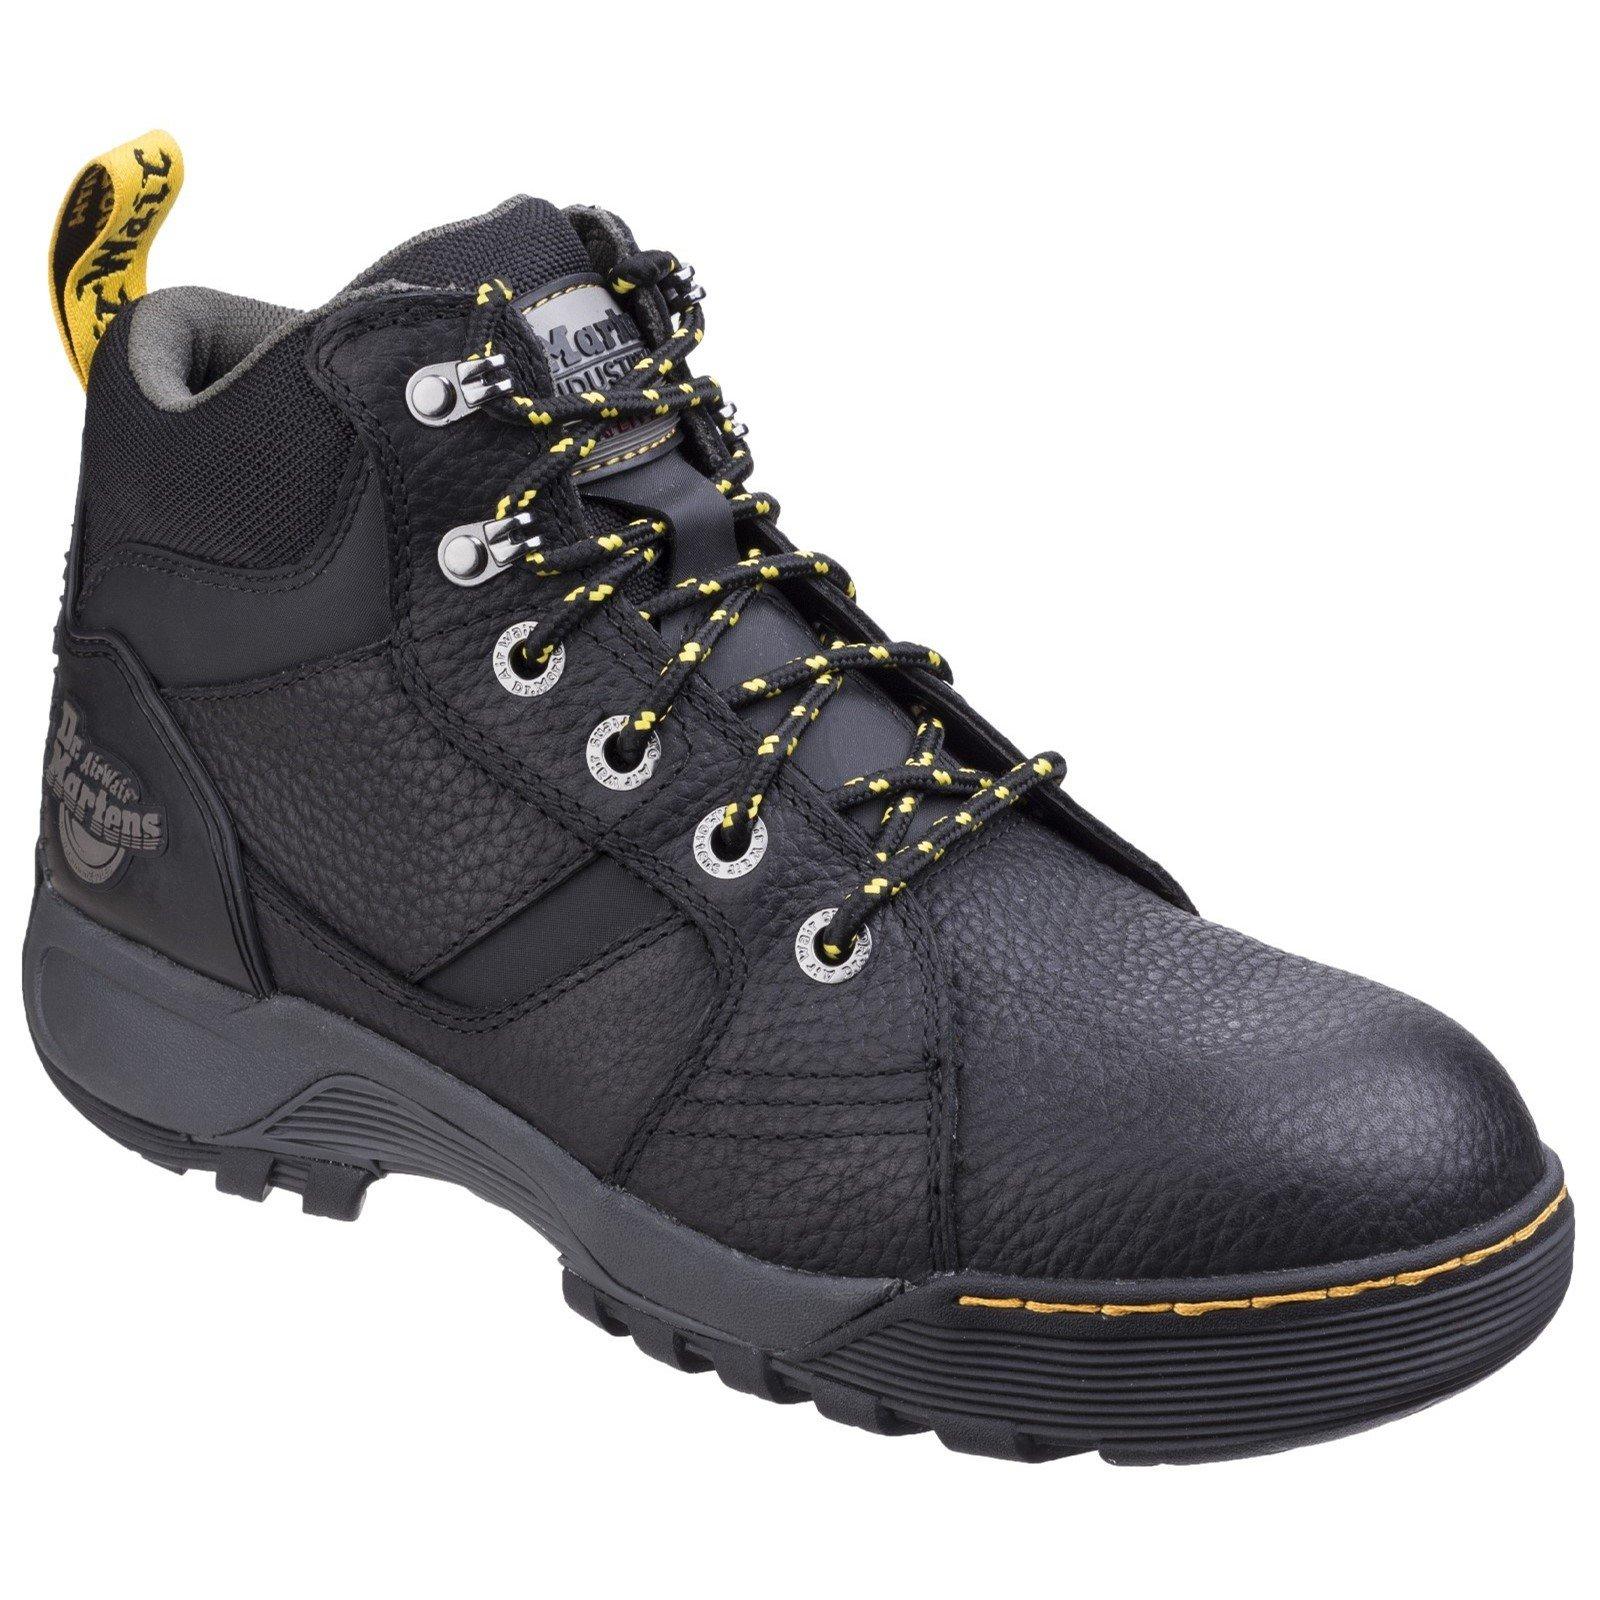 Dr Martens Men's Grapple Safety Boot Various Colours 26023 - Black 13